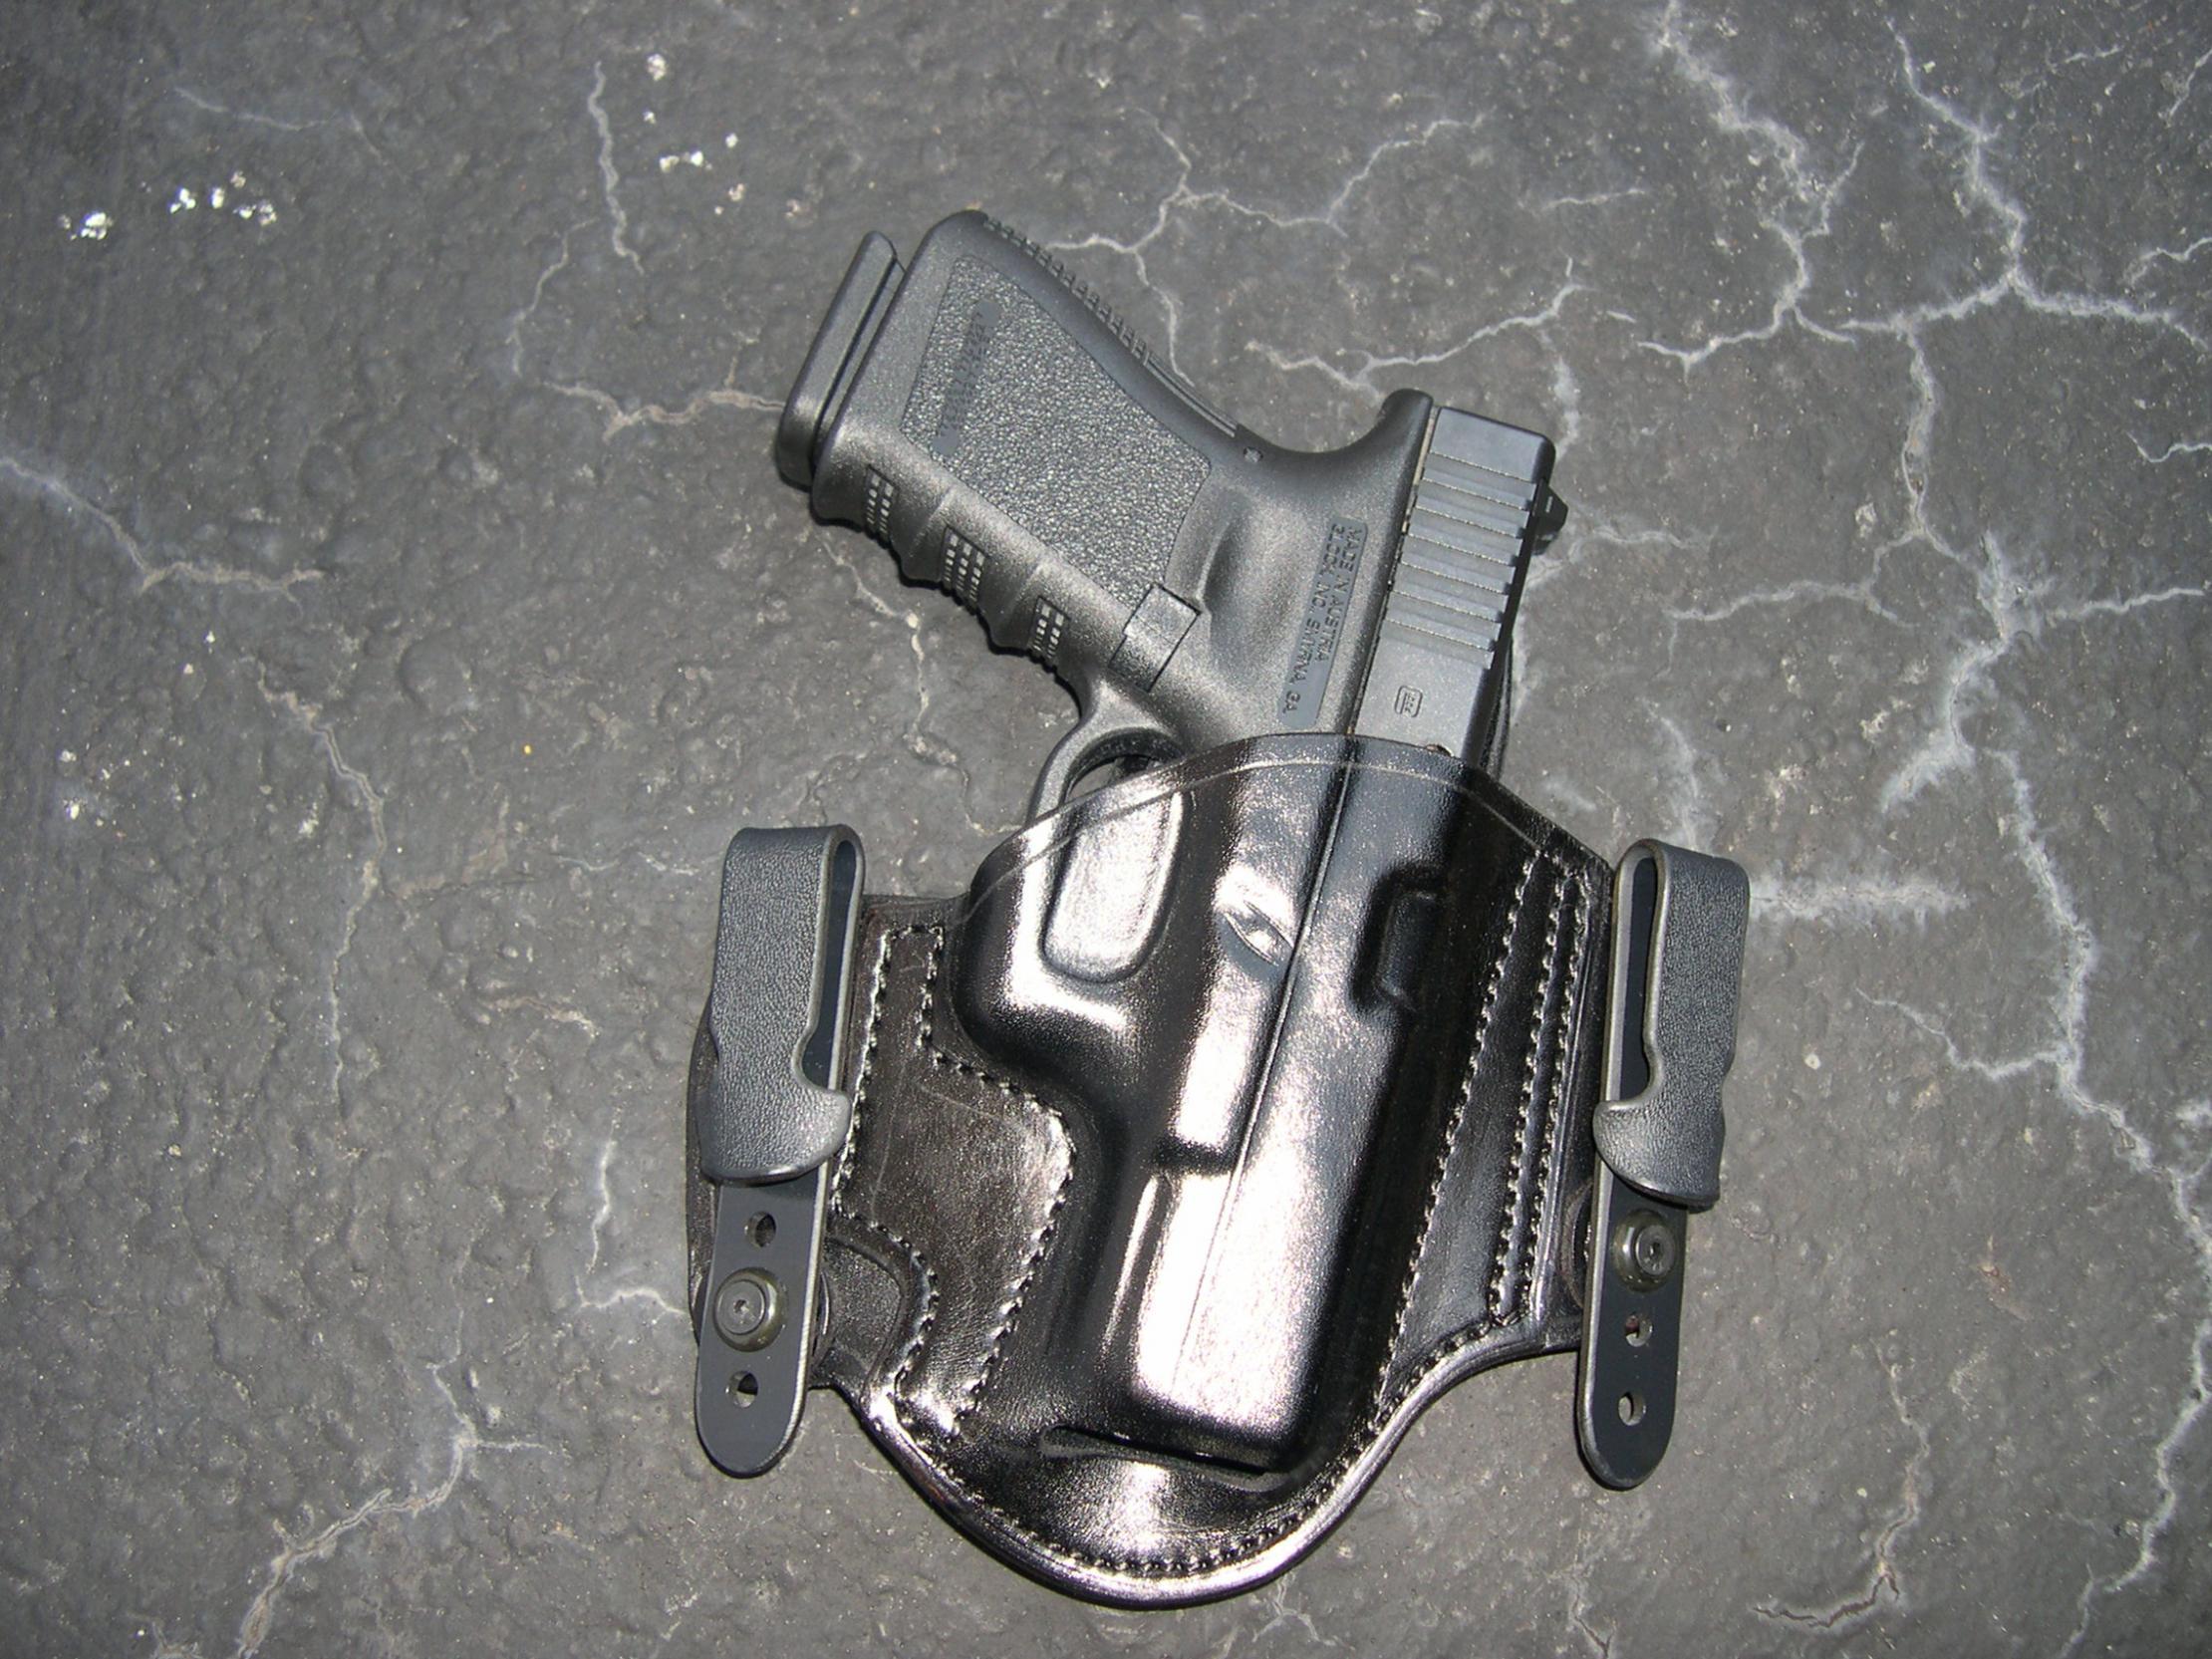 G23 Concealed Holster-img2102.jpg